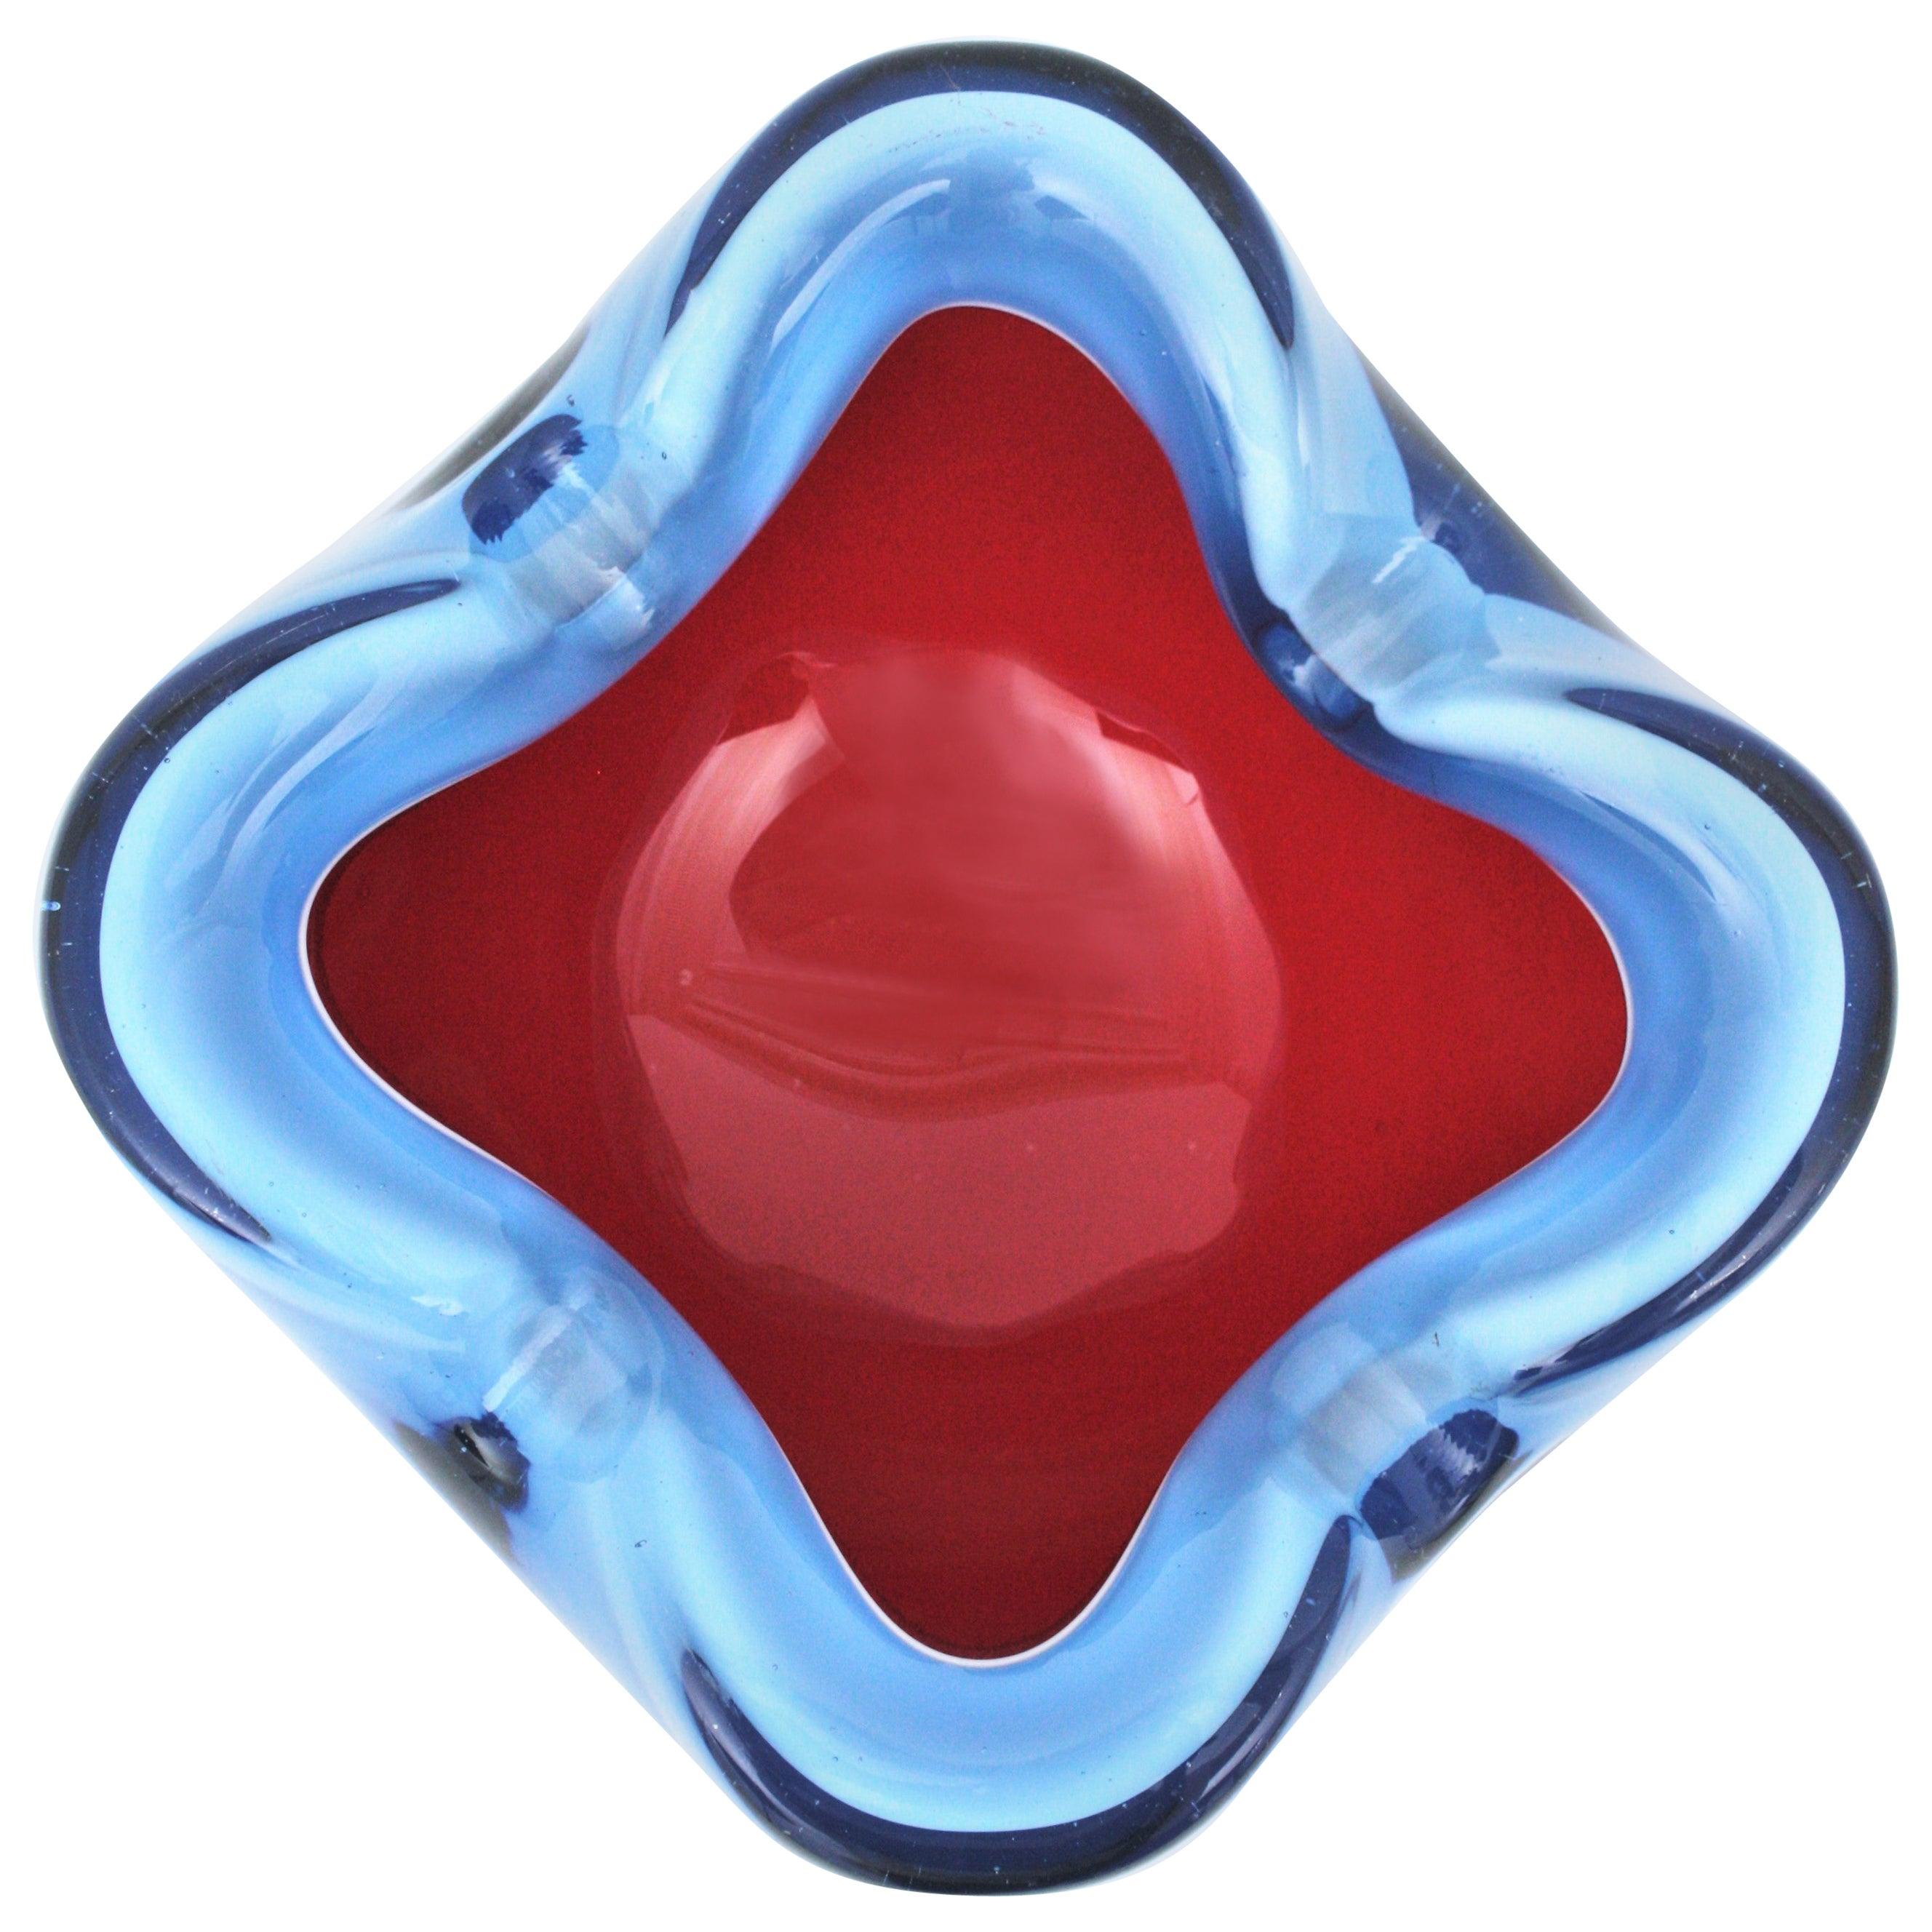 Seguso Murano Sommerso Red Blue Italian Art Glass Bowl / Ashtray